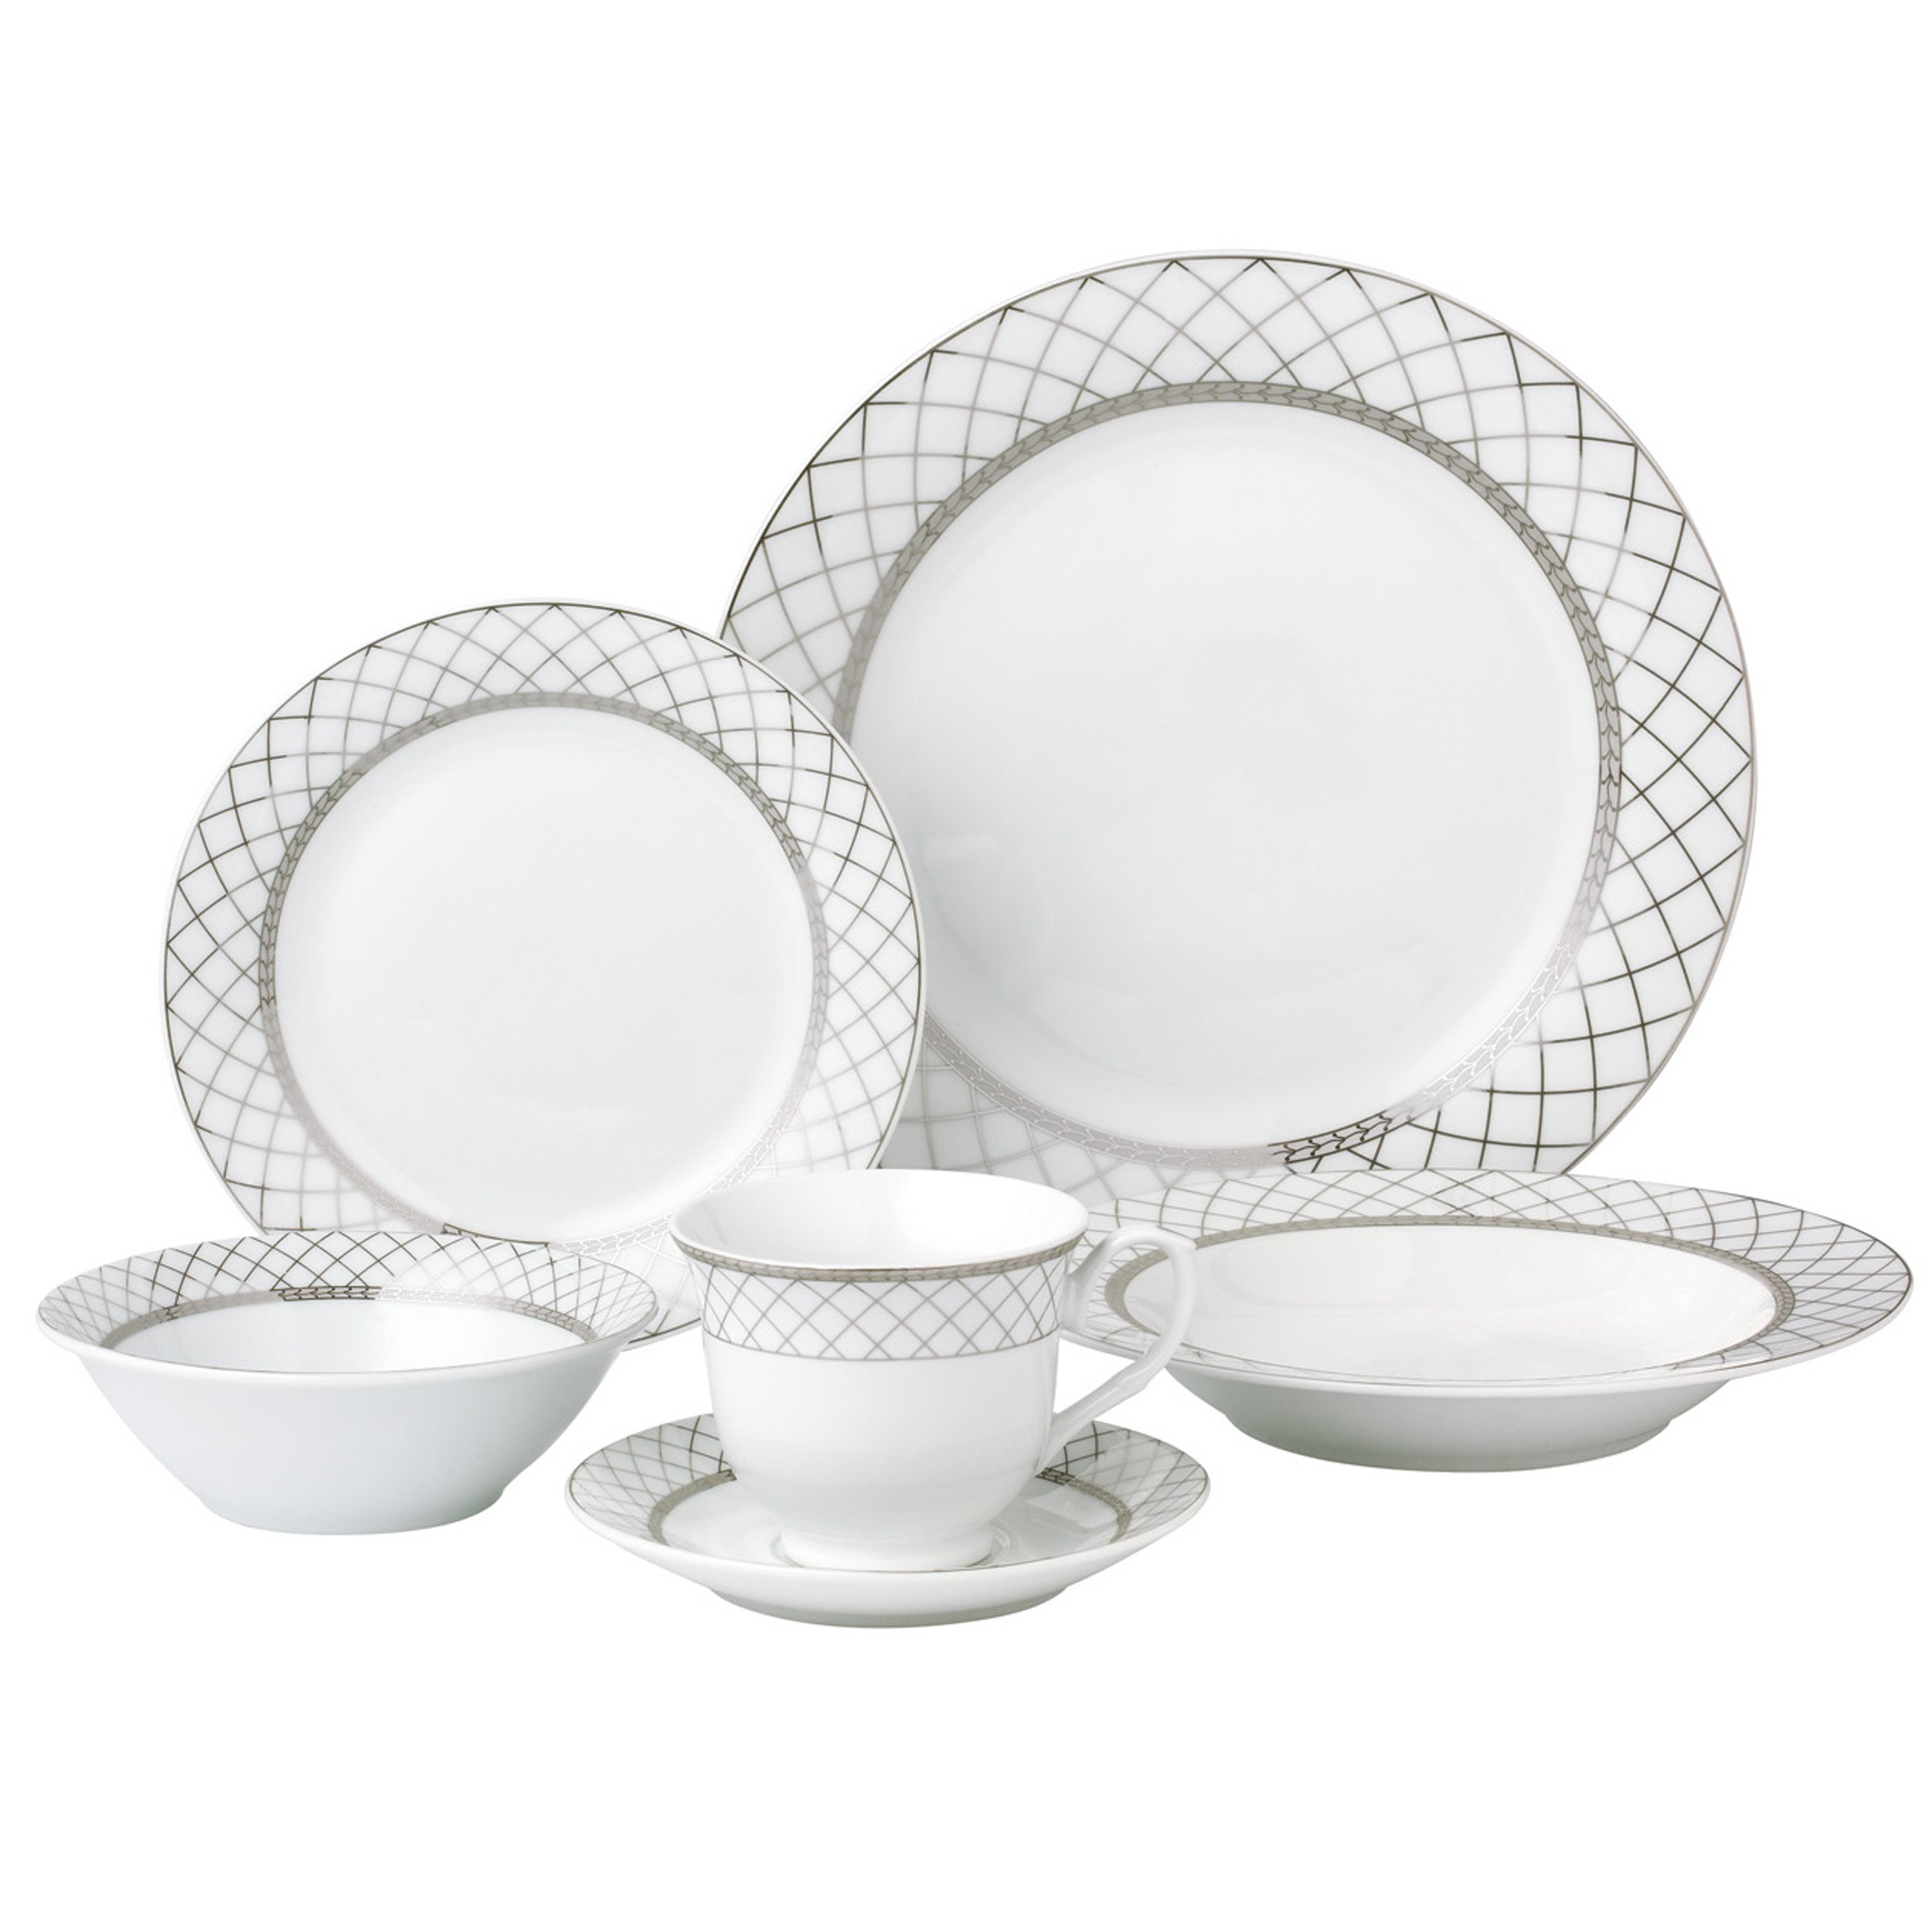 Lorren Home Trends 24 Piece Porcelain Dinnerware Set Verona, Silver - LH419